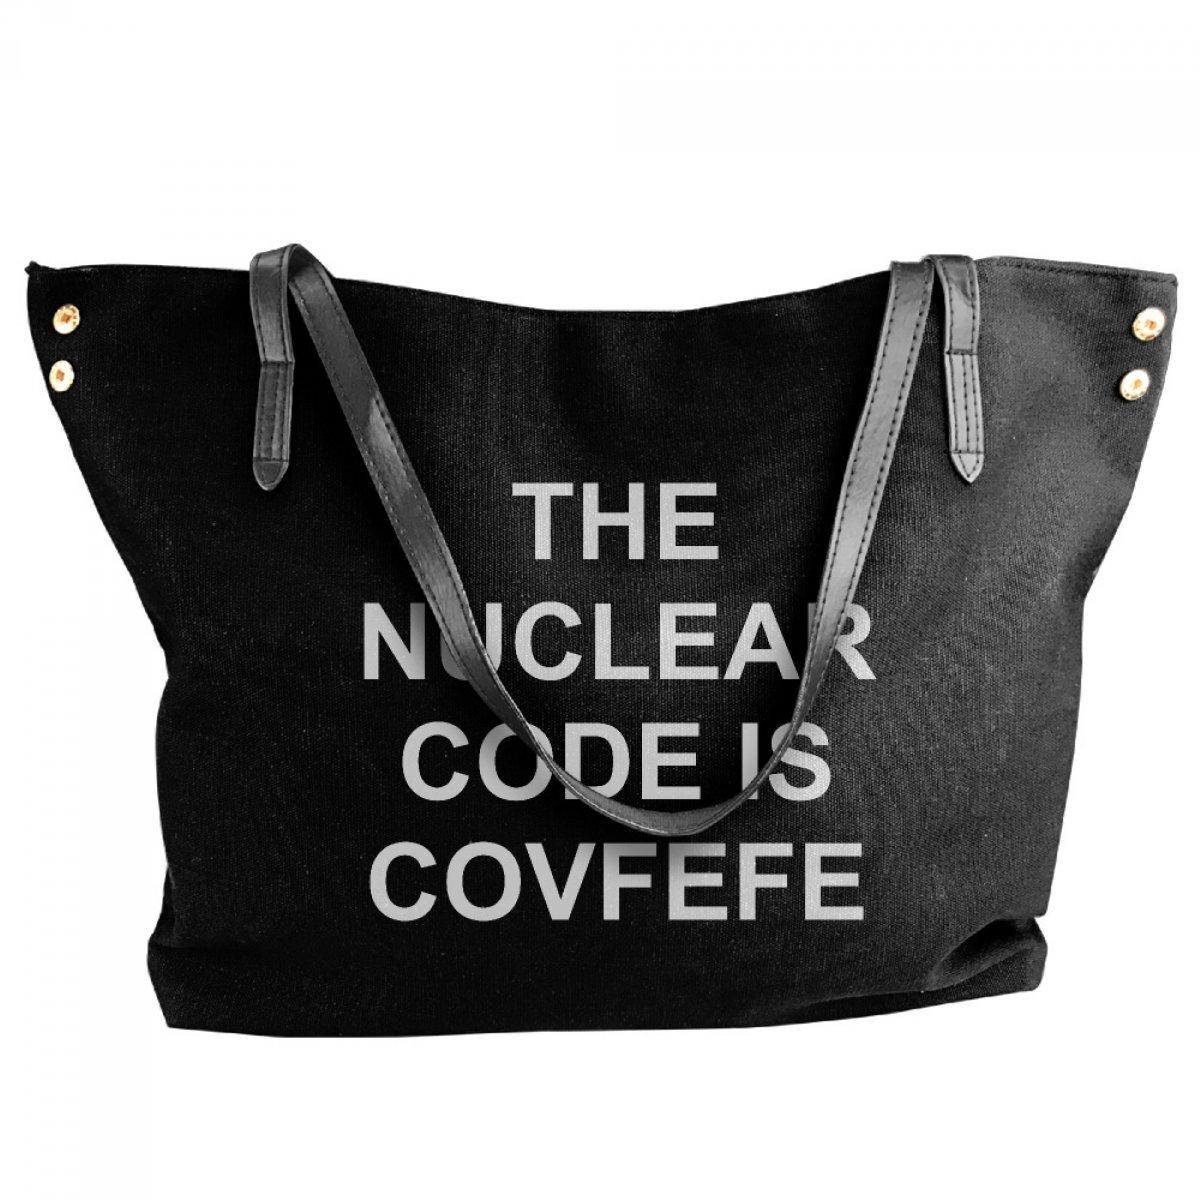 PhoRock Women Single Shoulder Handbag COVFEFE Hotspot Code Alphabet Female Black Canvas Shoulder Bag FDRA009 0